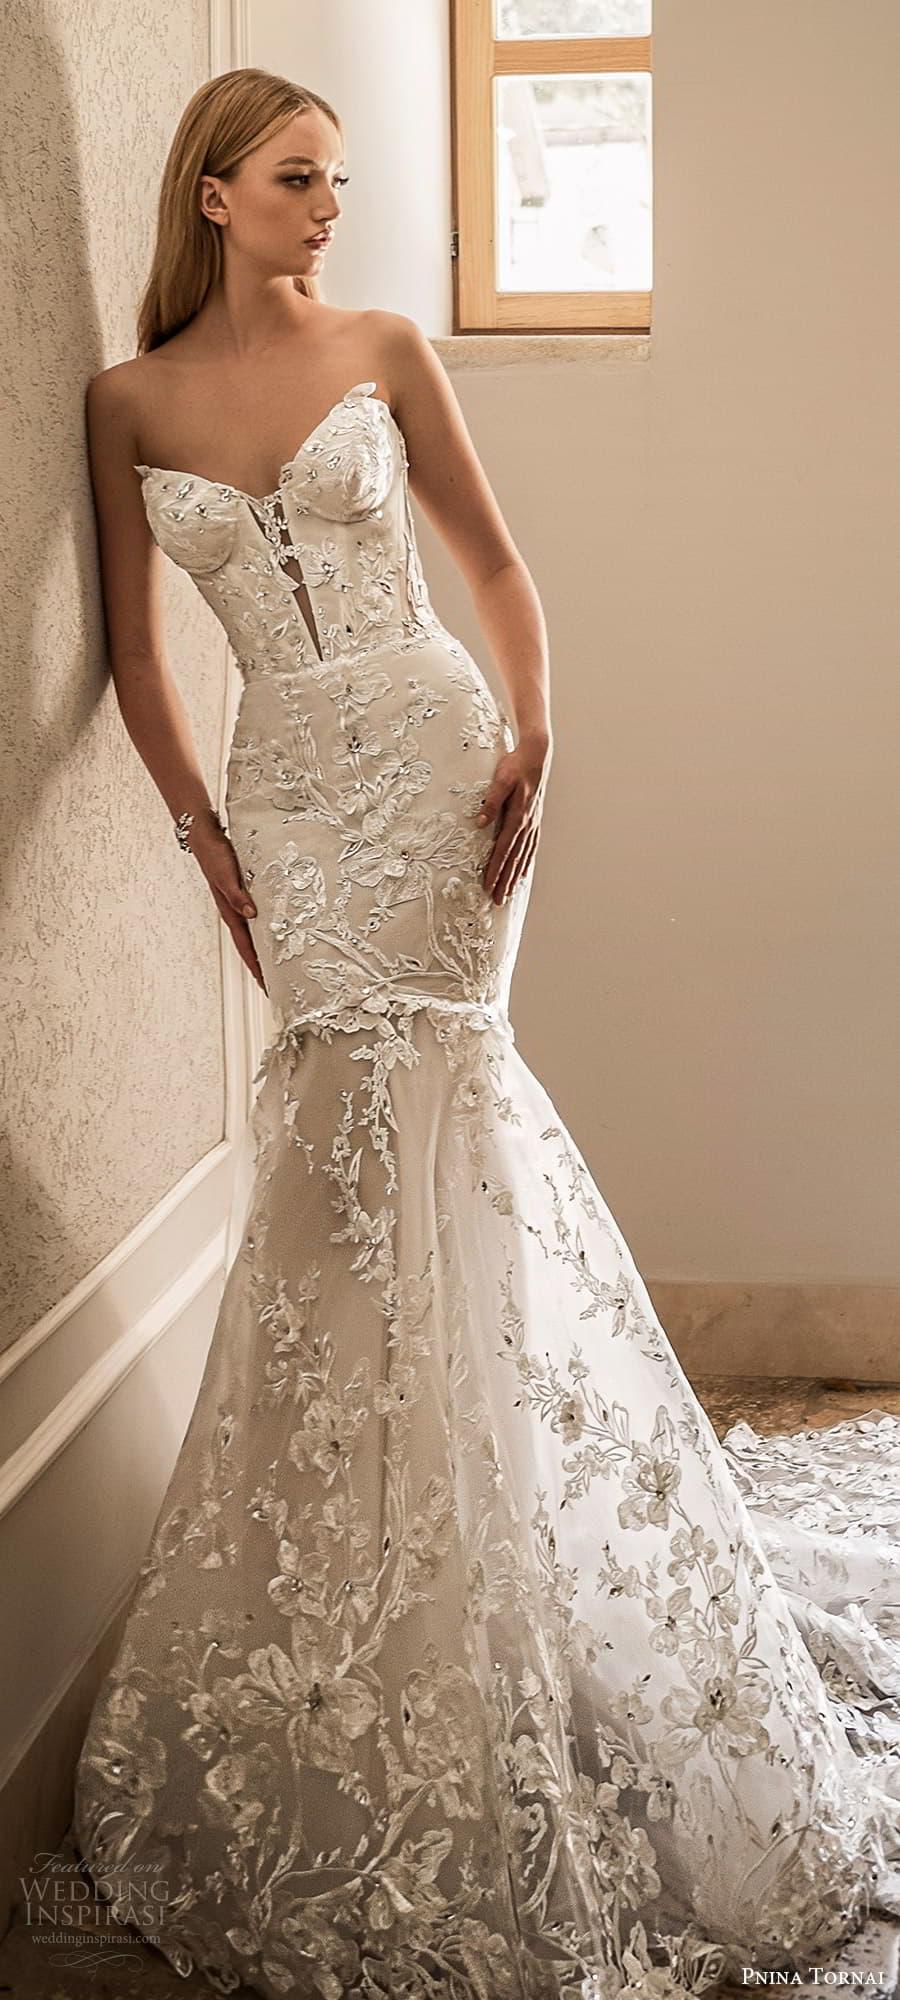 pnina tornai 2022 love bridal strapless sweetheart neckline fully embellished fit flare mermaid wedding dress chapel train (16) mv